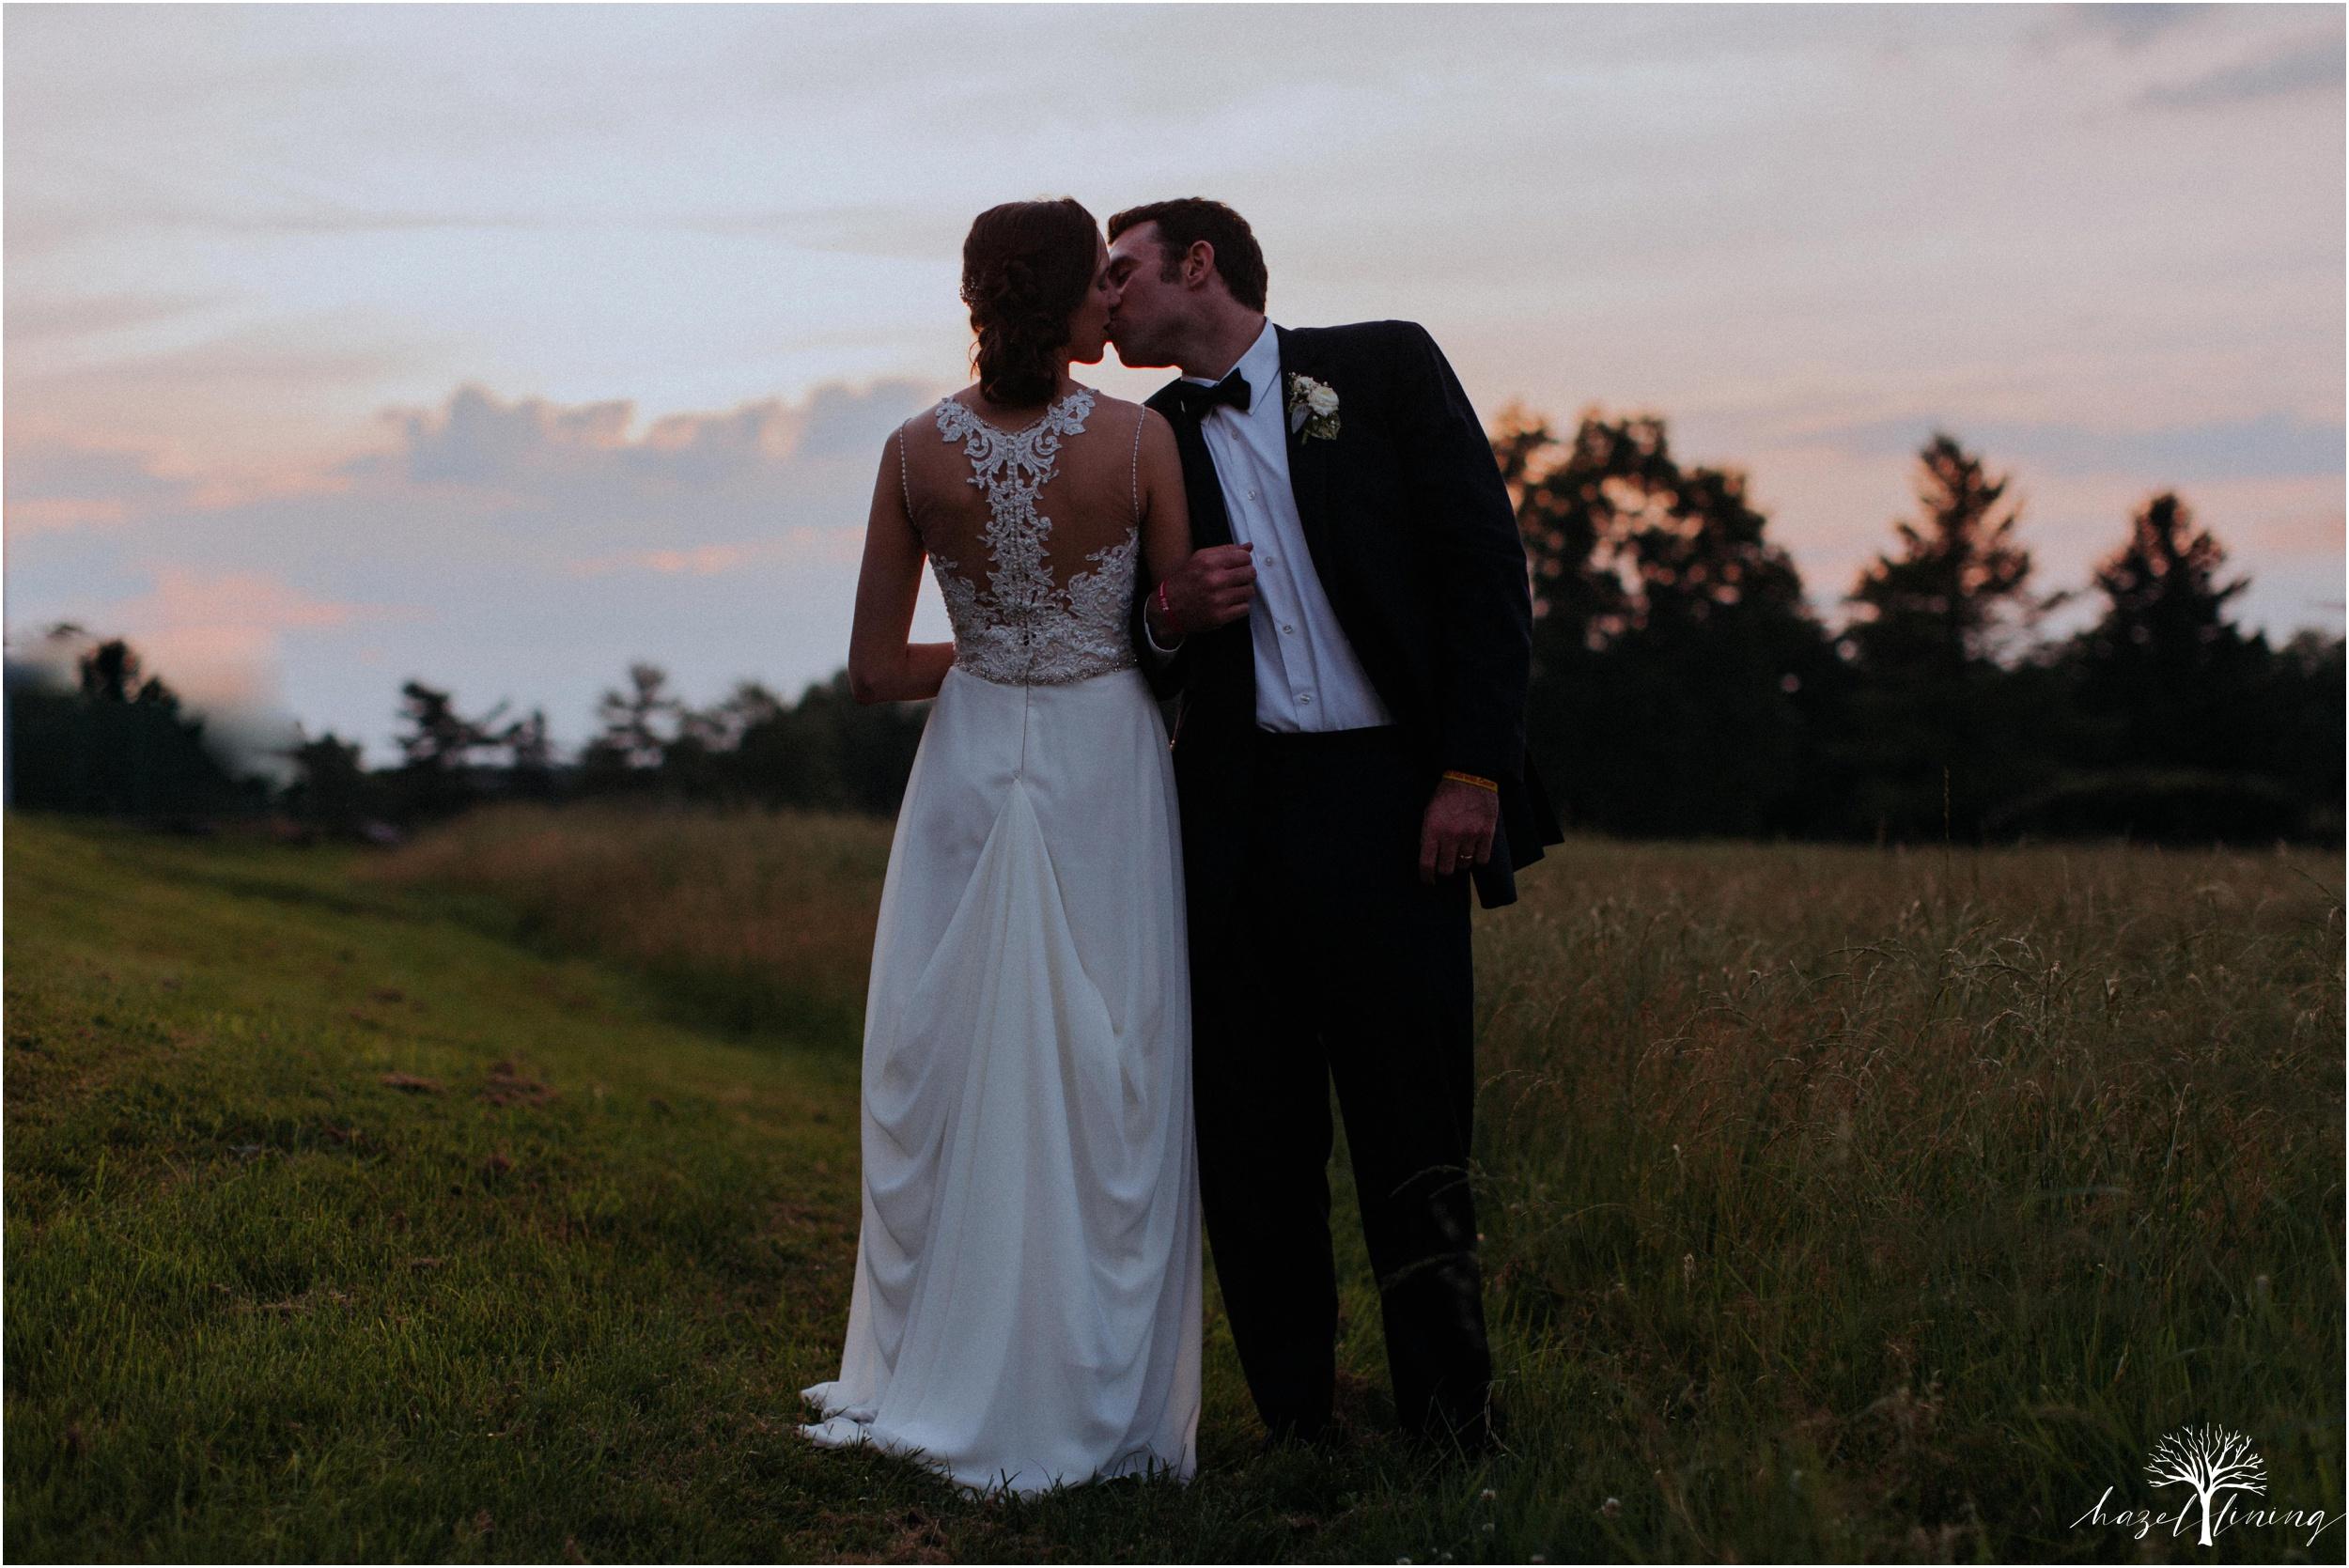 hazel-lining-travel-wedding-elopement-photography_0179.jpg